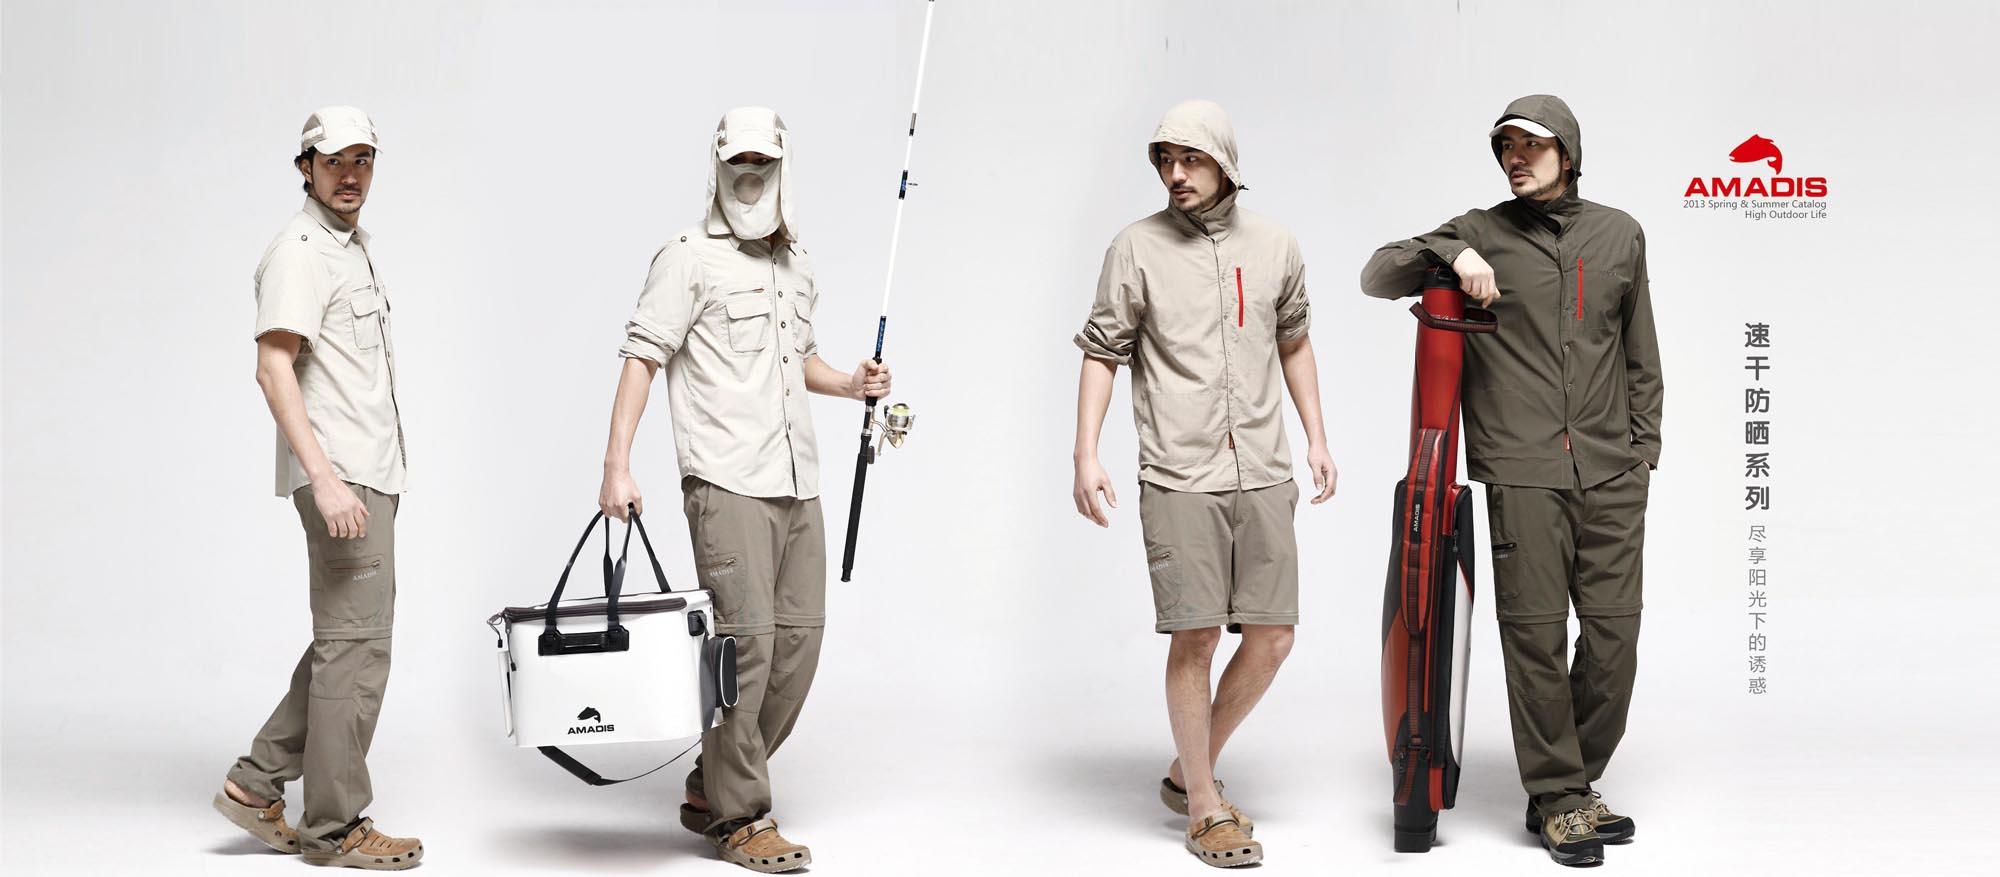 2013AMADIS阿玛迪斯夏季新品